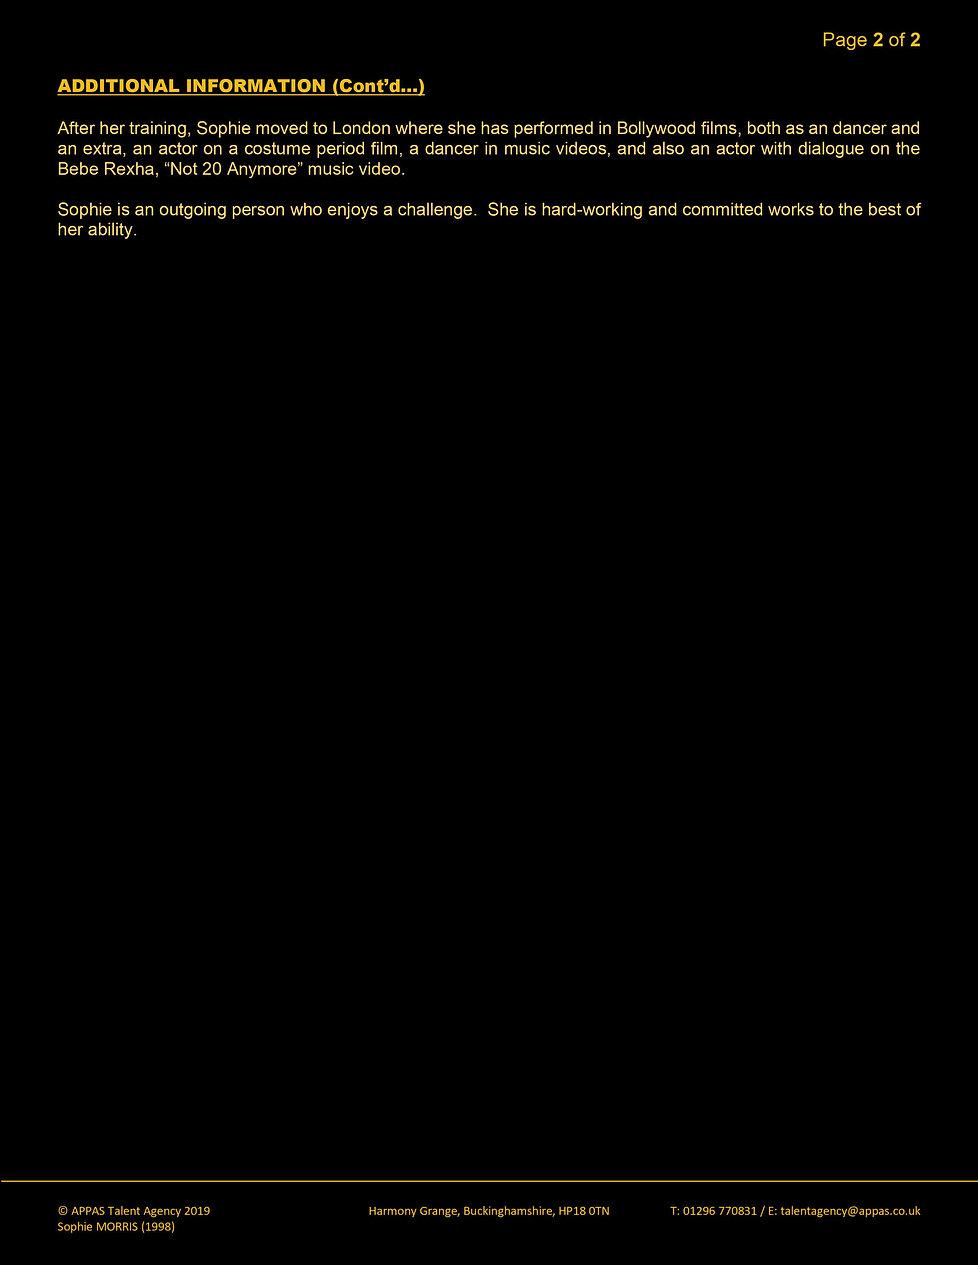 SOPHIE MORRIS WEB CV (APR 2020) 2.jpg